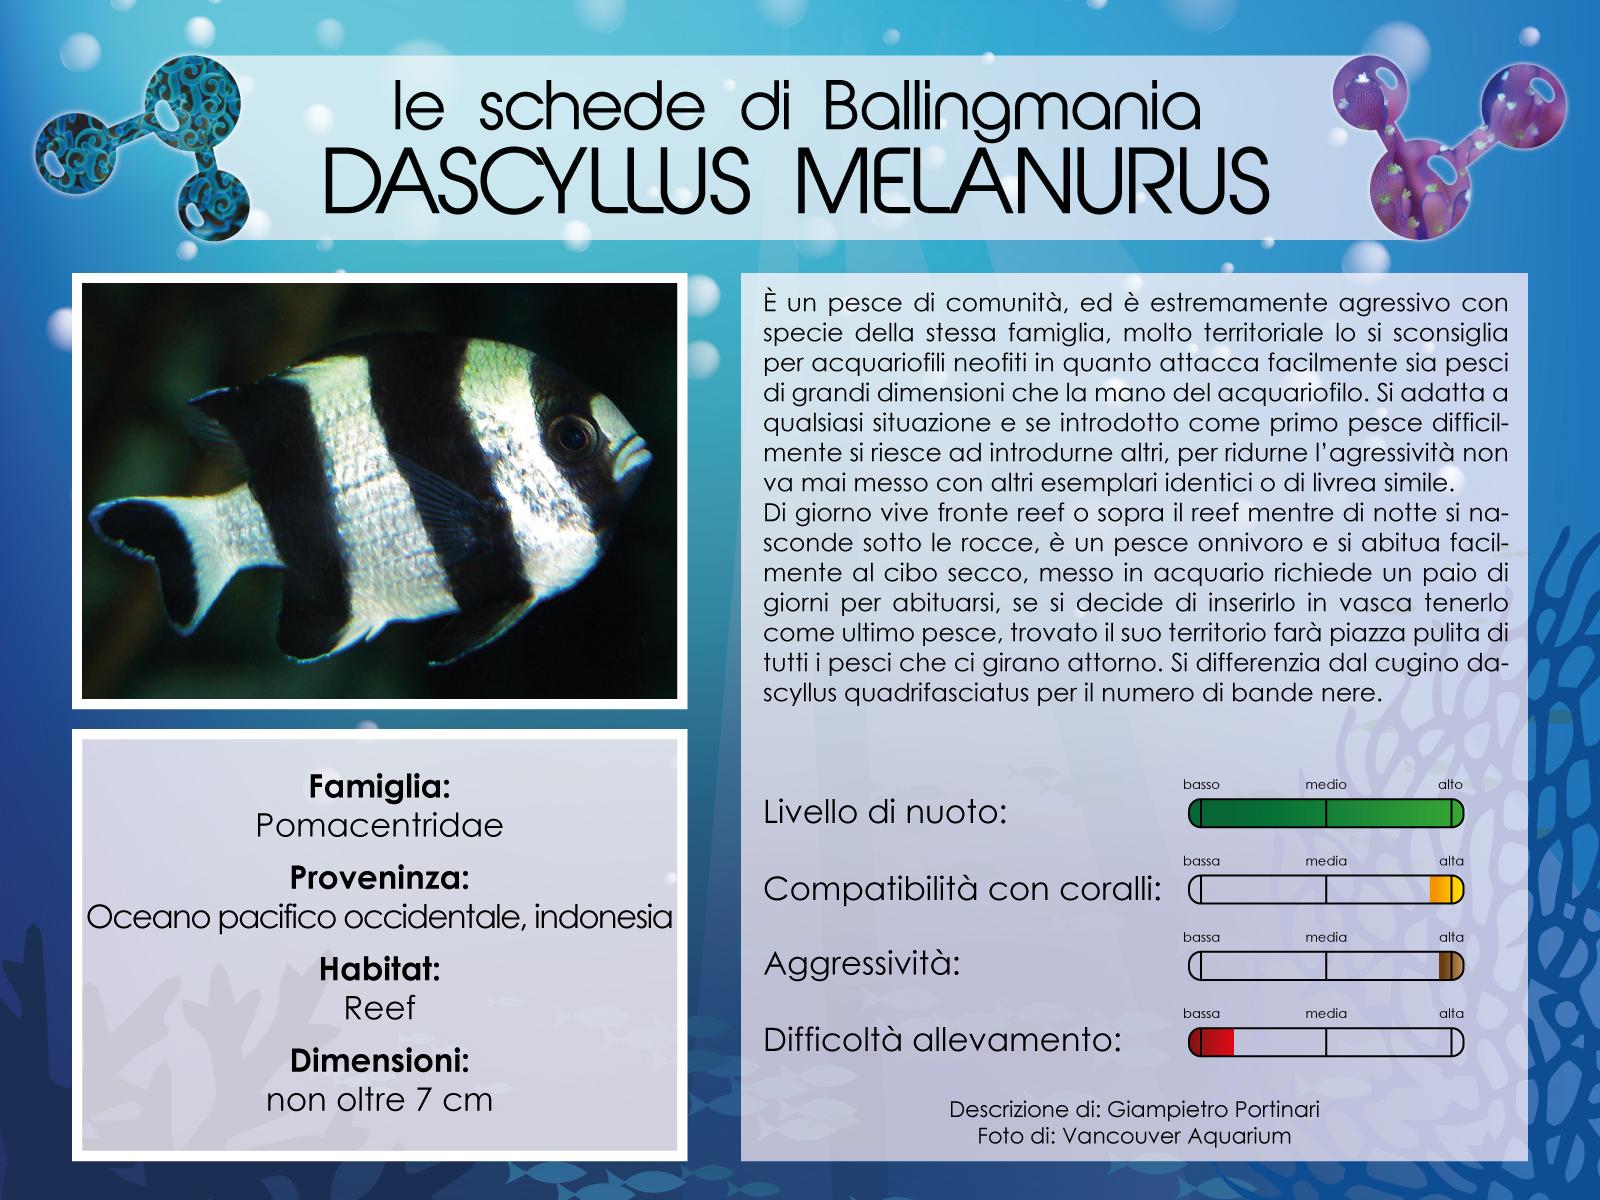 Dascyllus Melanurus